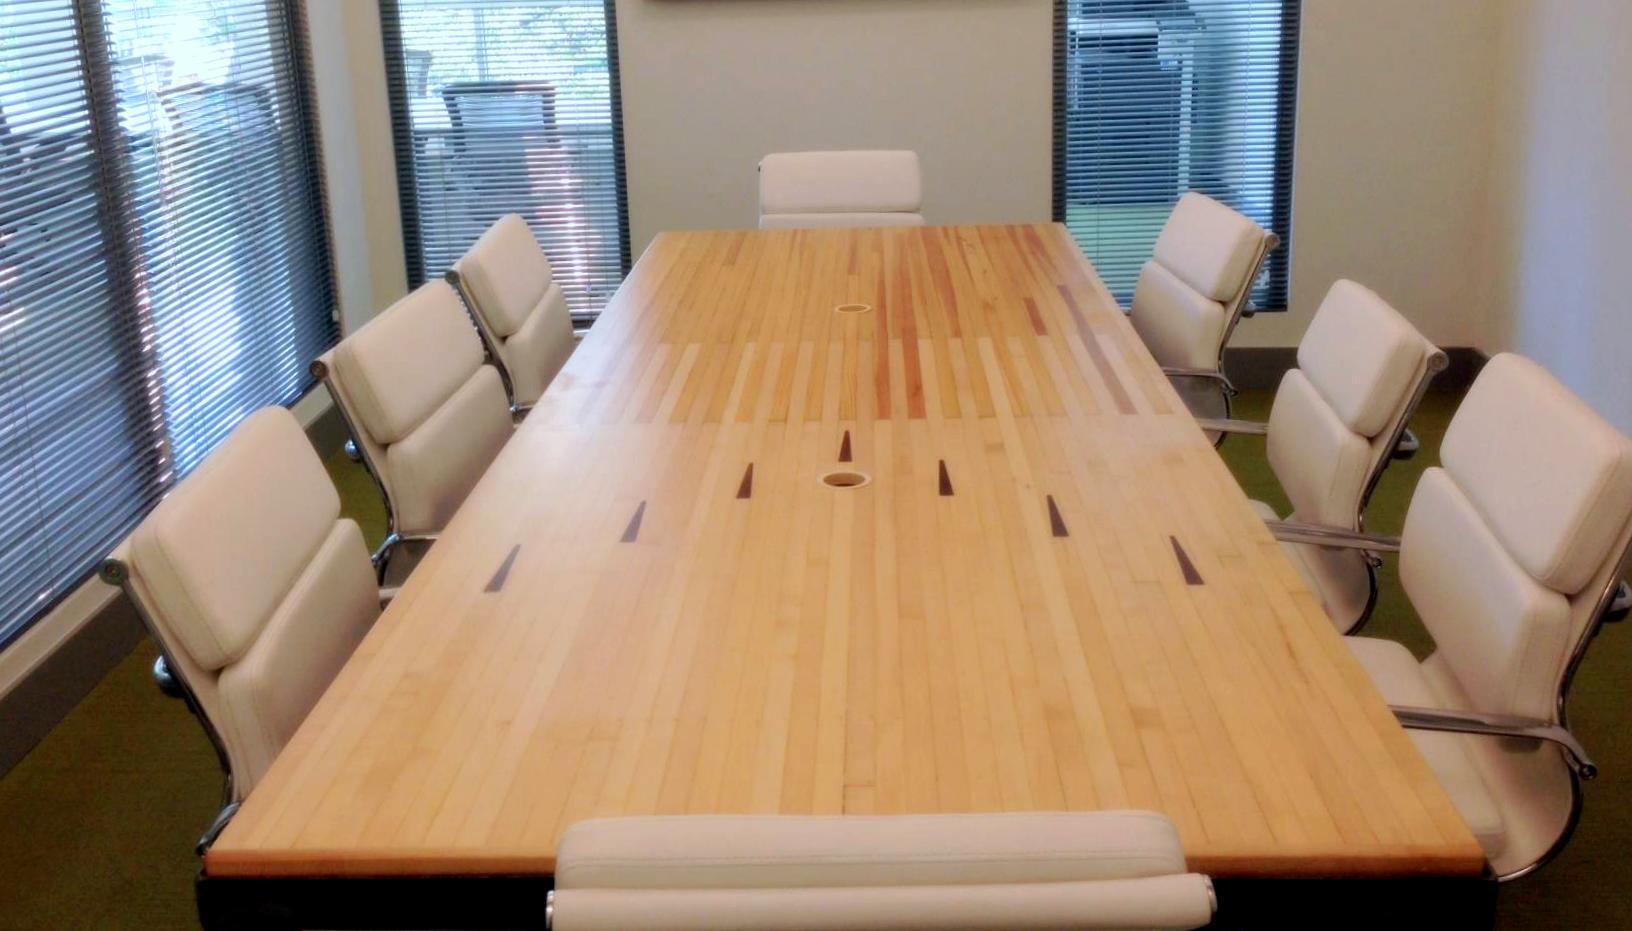 EcoJacks Conference Table Featured In New Bro Miami Location